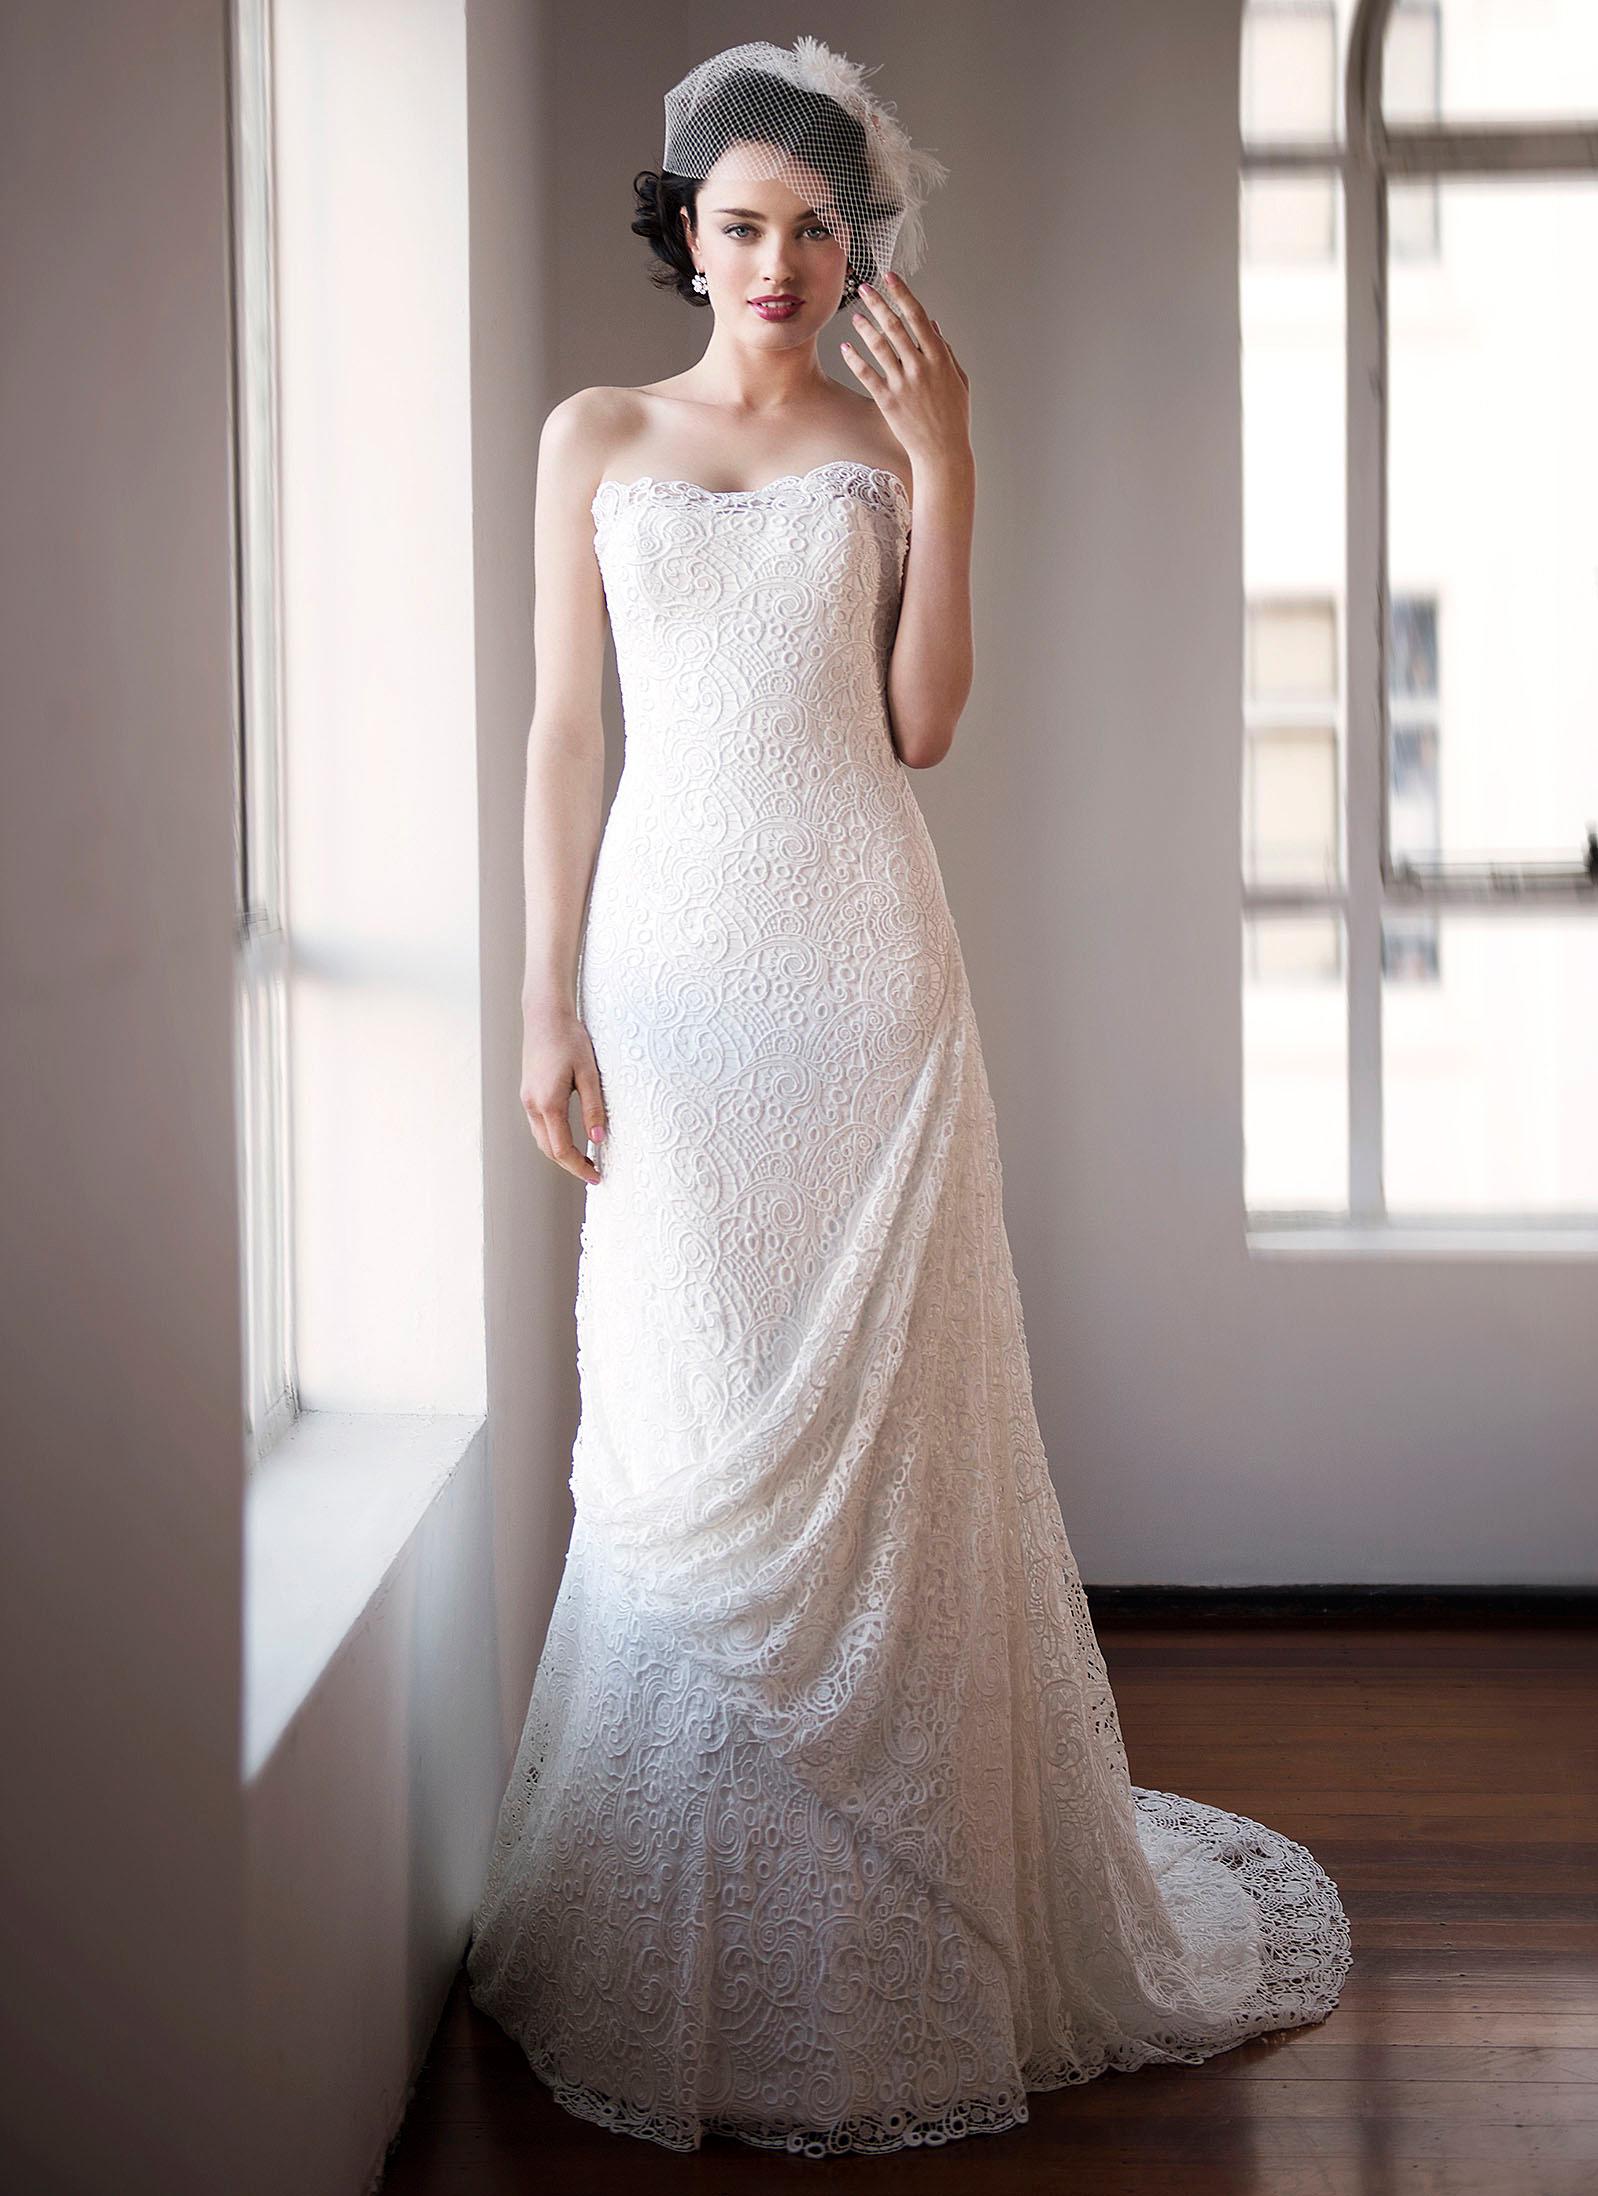 patterns wedding dresses photo - 1